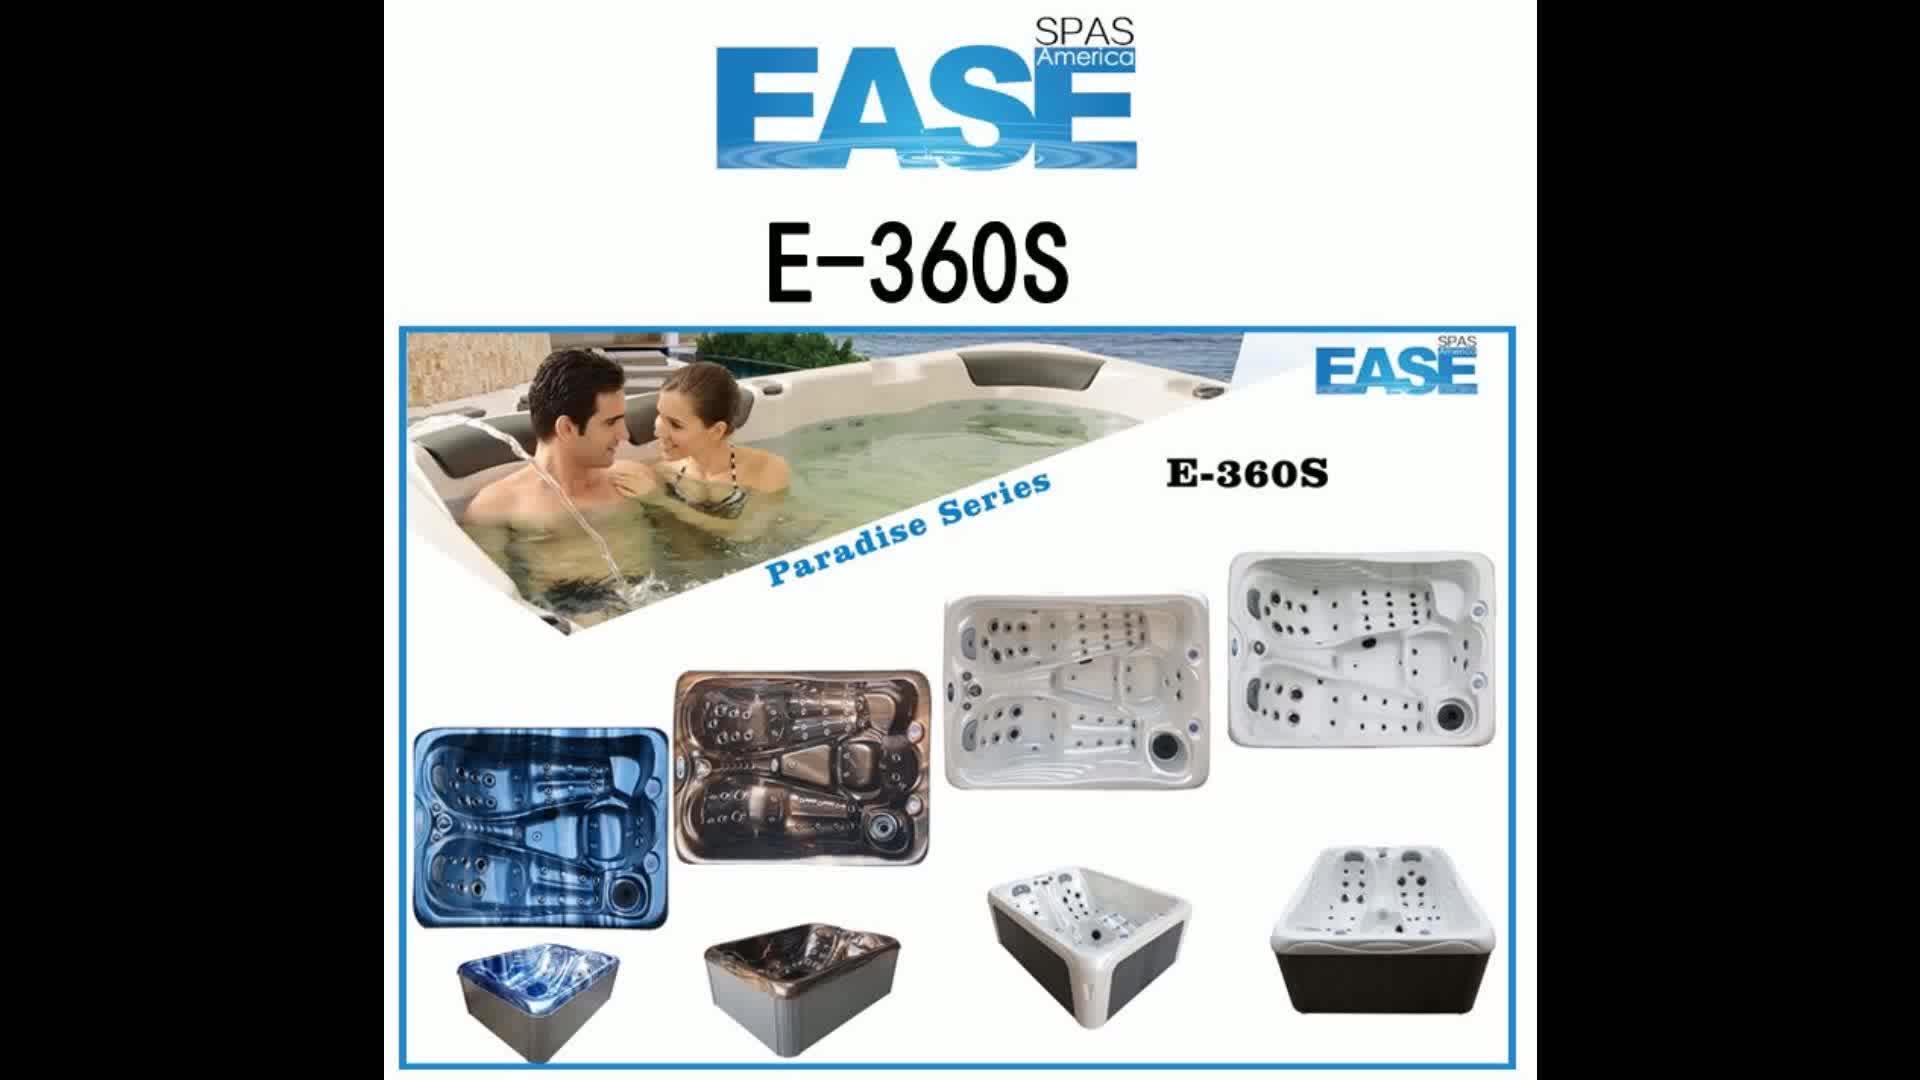 Neue Design Schokolade & perle luxus Wasserfall Led Licht ecke licht E-360S MINI Whirlpool Spa Whirlpools